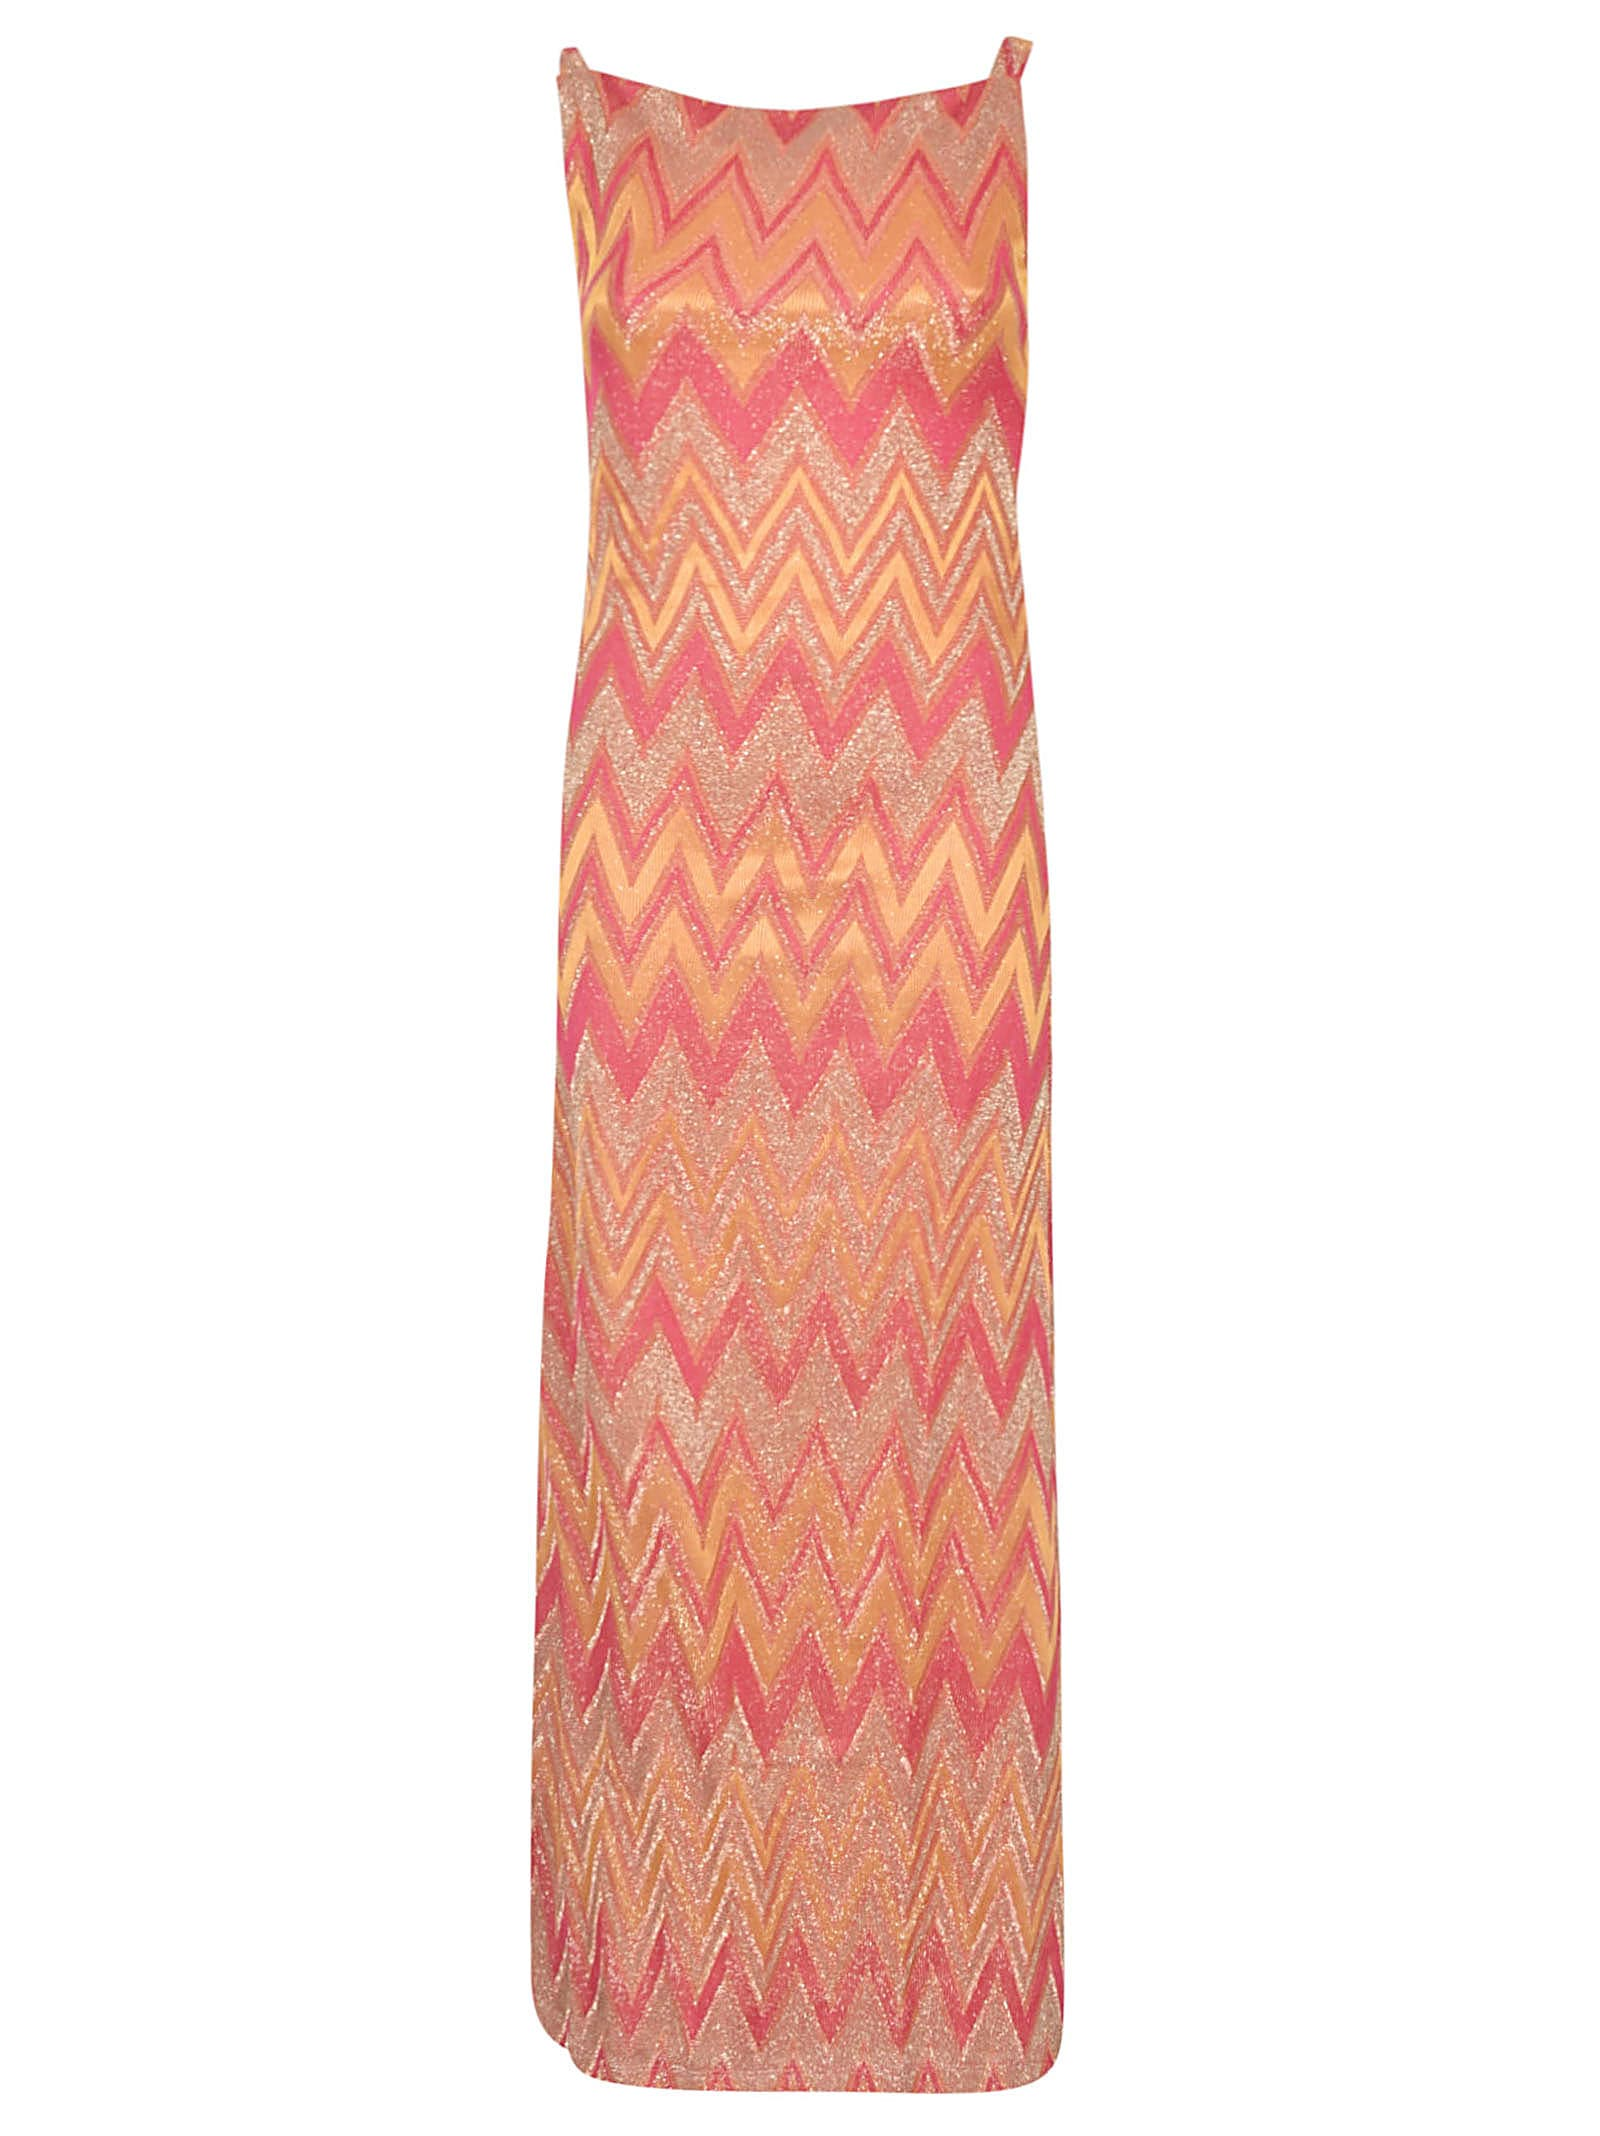 Buy M Missoni Zigzag Sleeveless Dress online, shop M Missoni with free shipping